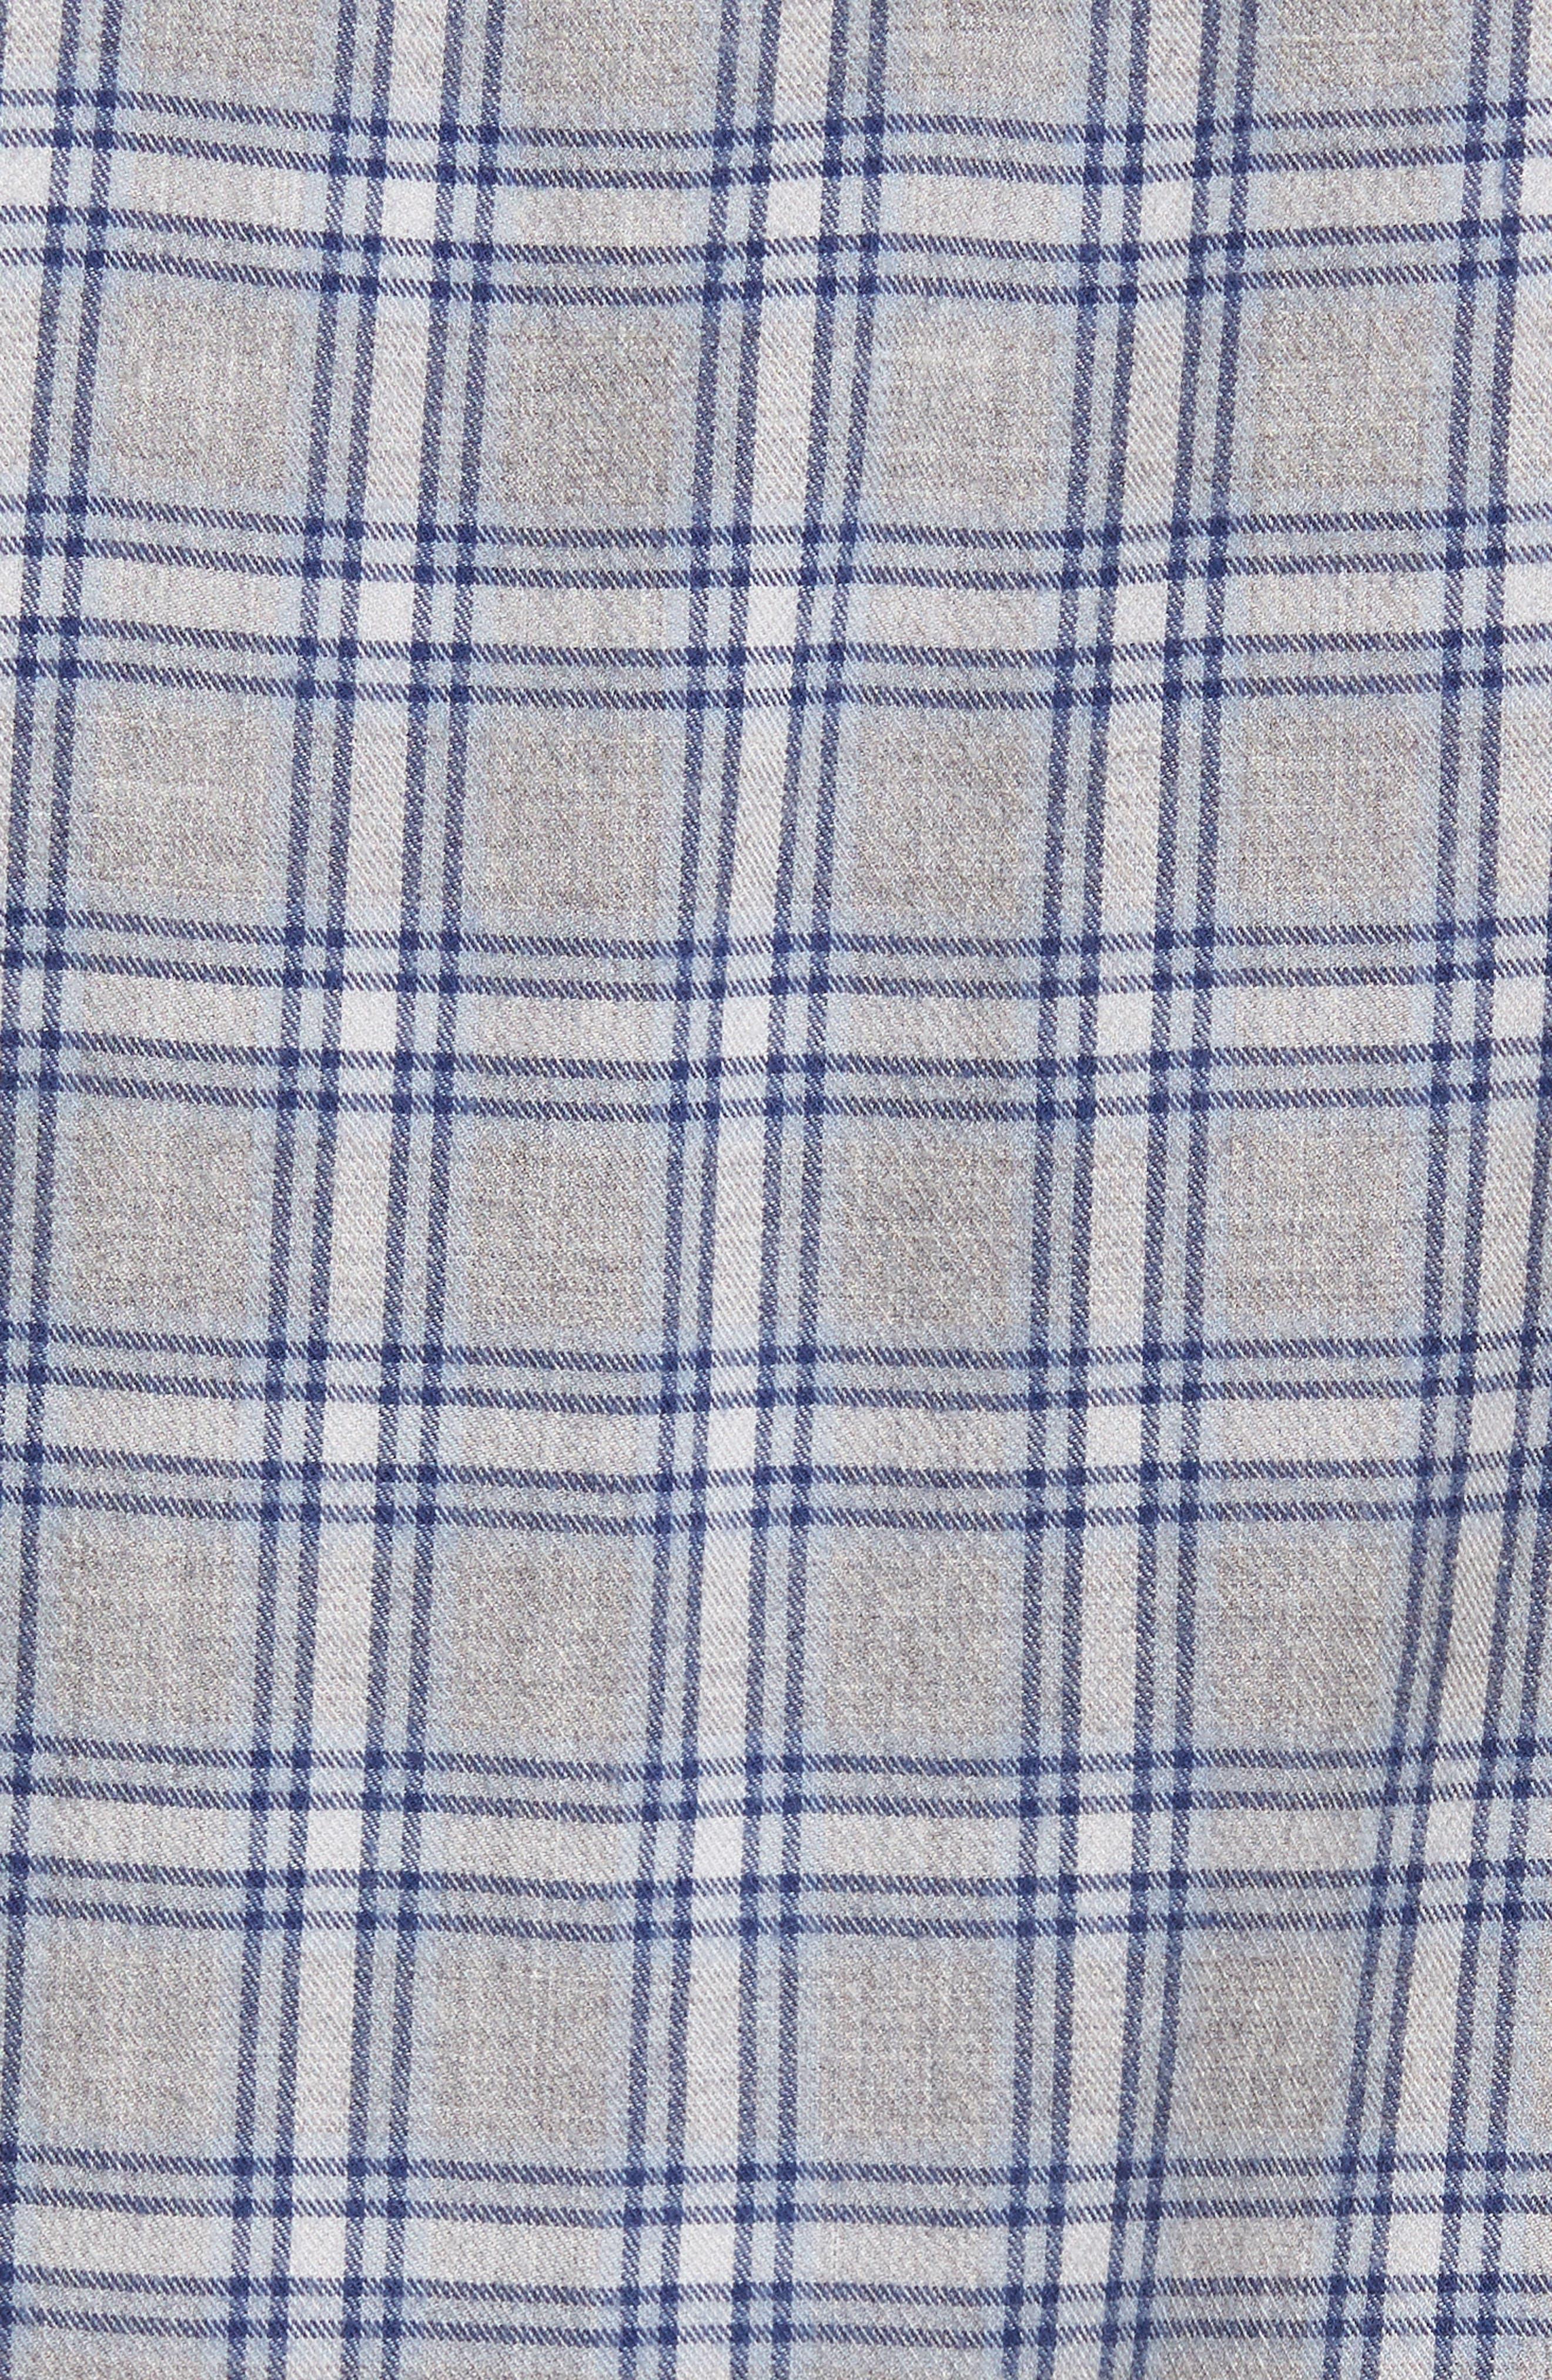 Workwear Duofold Check Sport Shirt,                             Alternate thumbnail 5, color,                             Navy Iris Grey Plaid Duofold